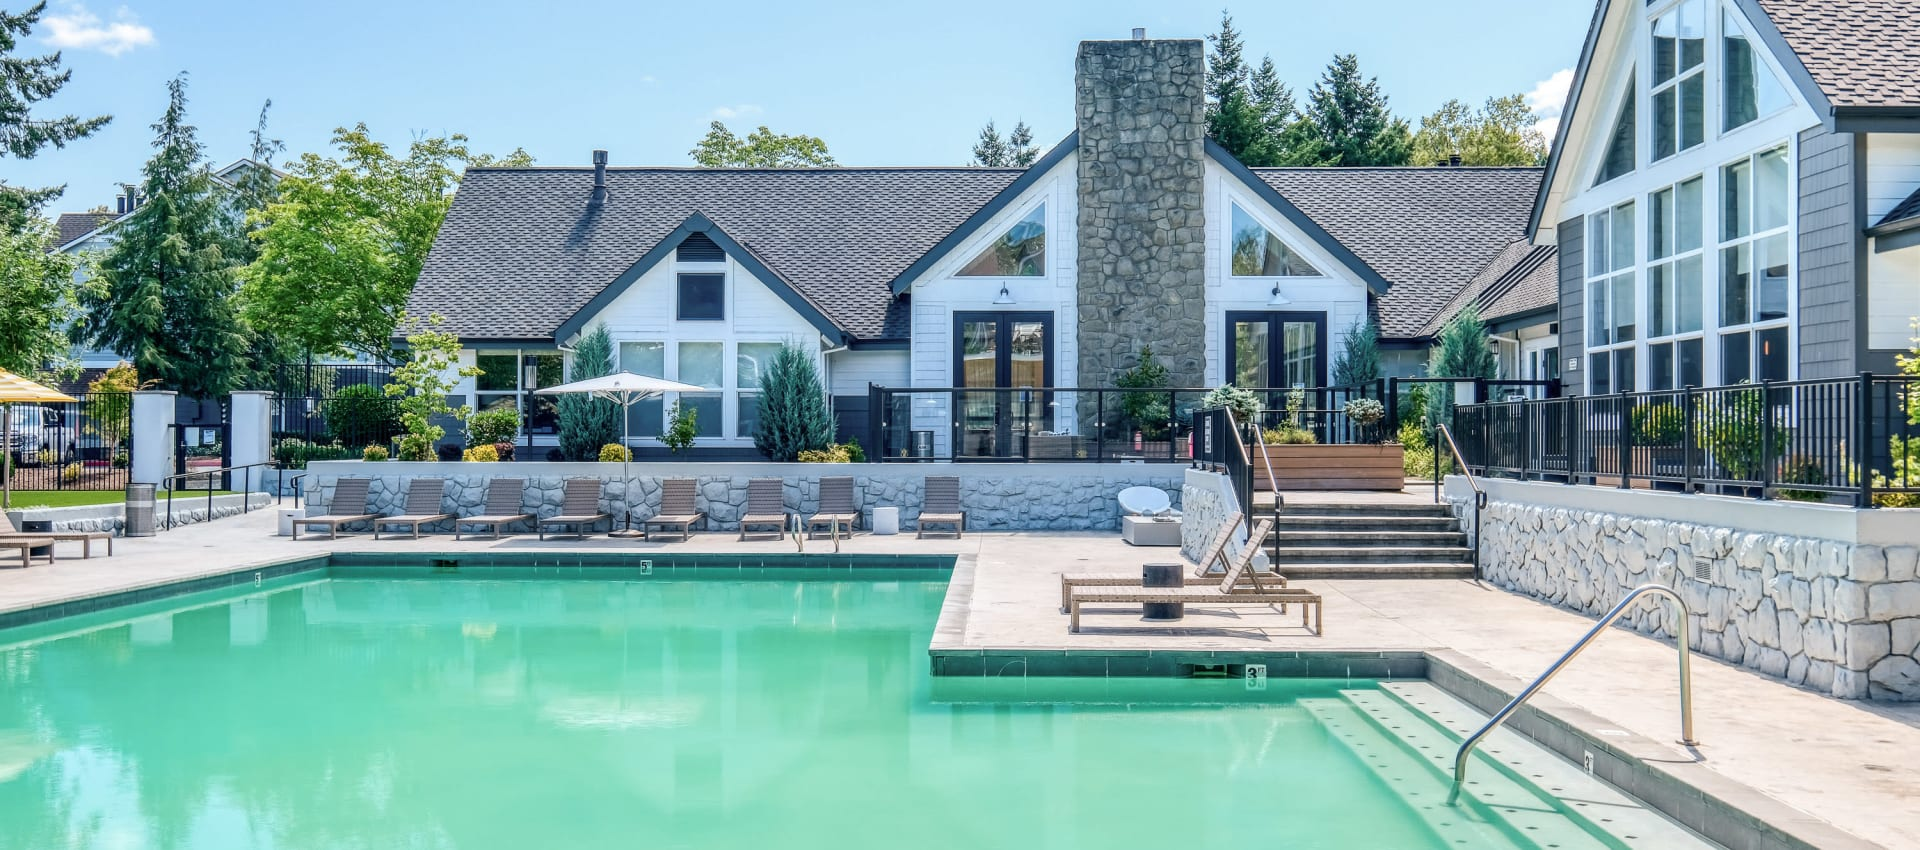 Swimming pool at Centro Apartment Homes in Hillsboro, Oregon